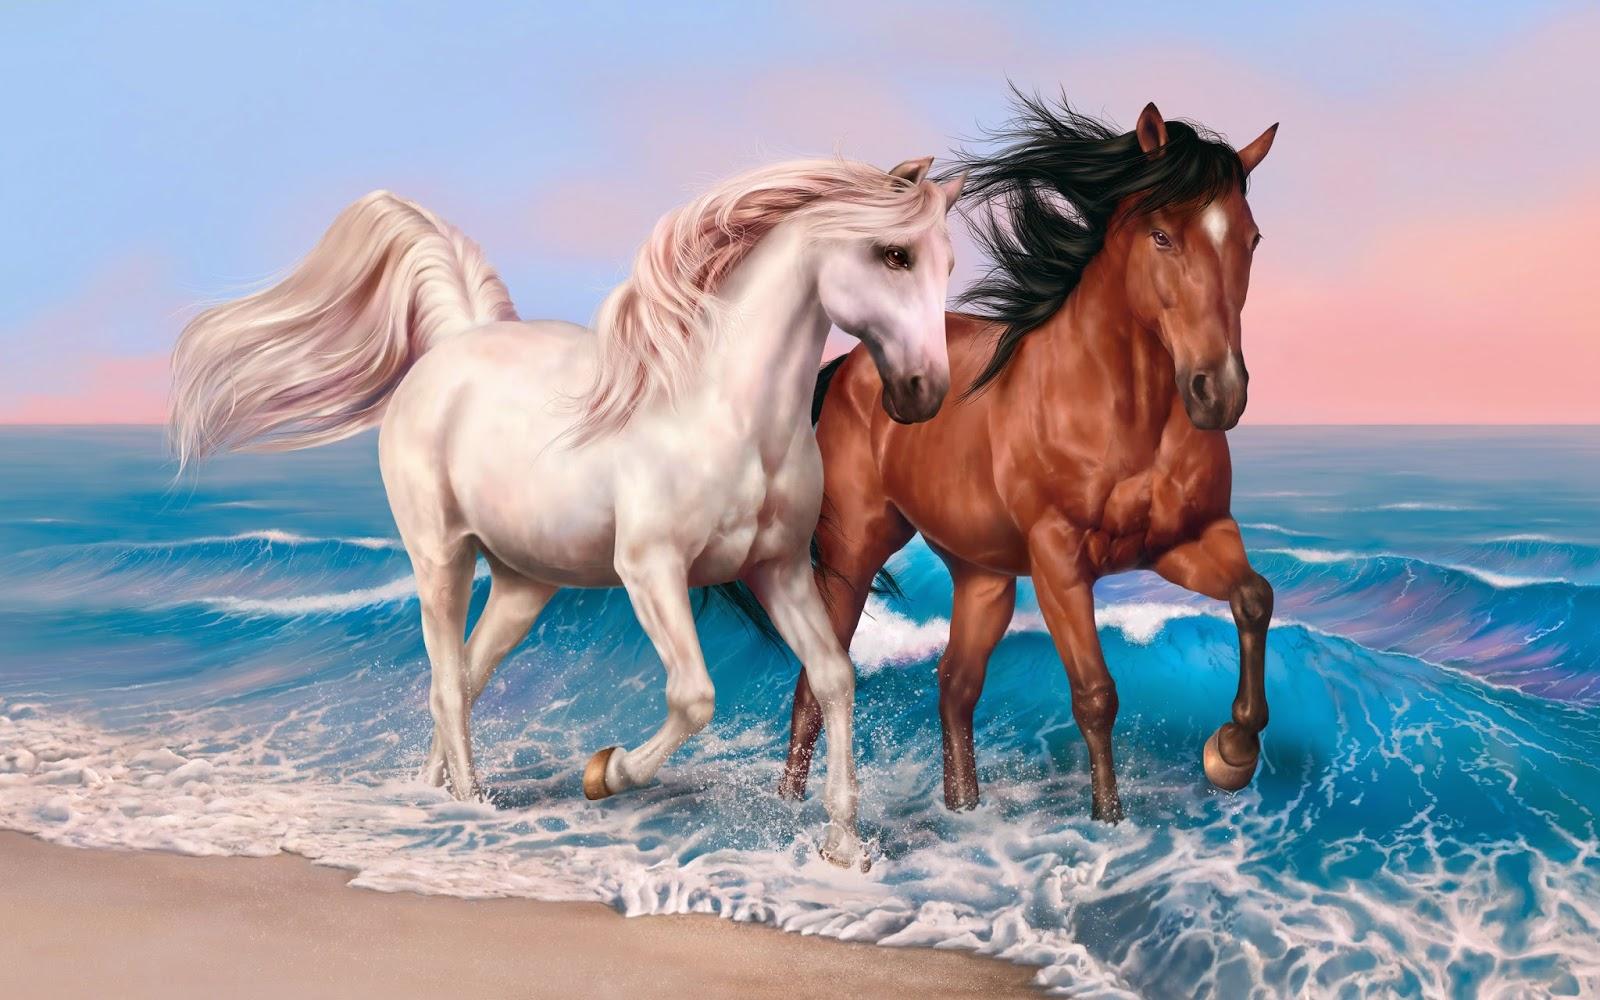 Beautiful   Wallpaper Horse Creative - horses_art-wide  Trends_993191.jpg